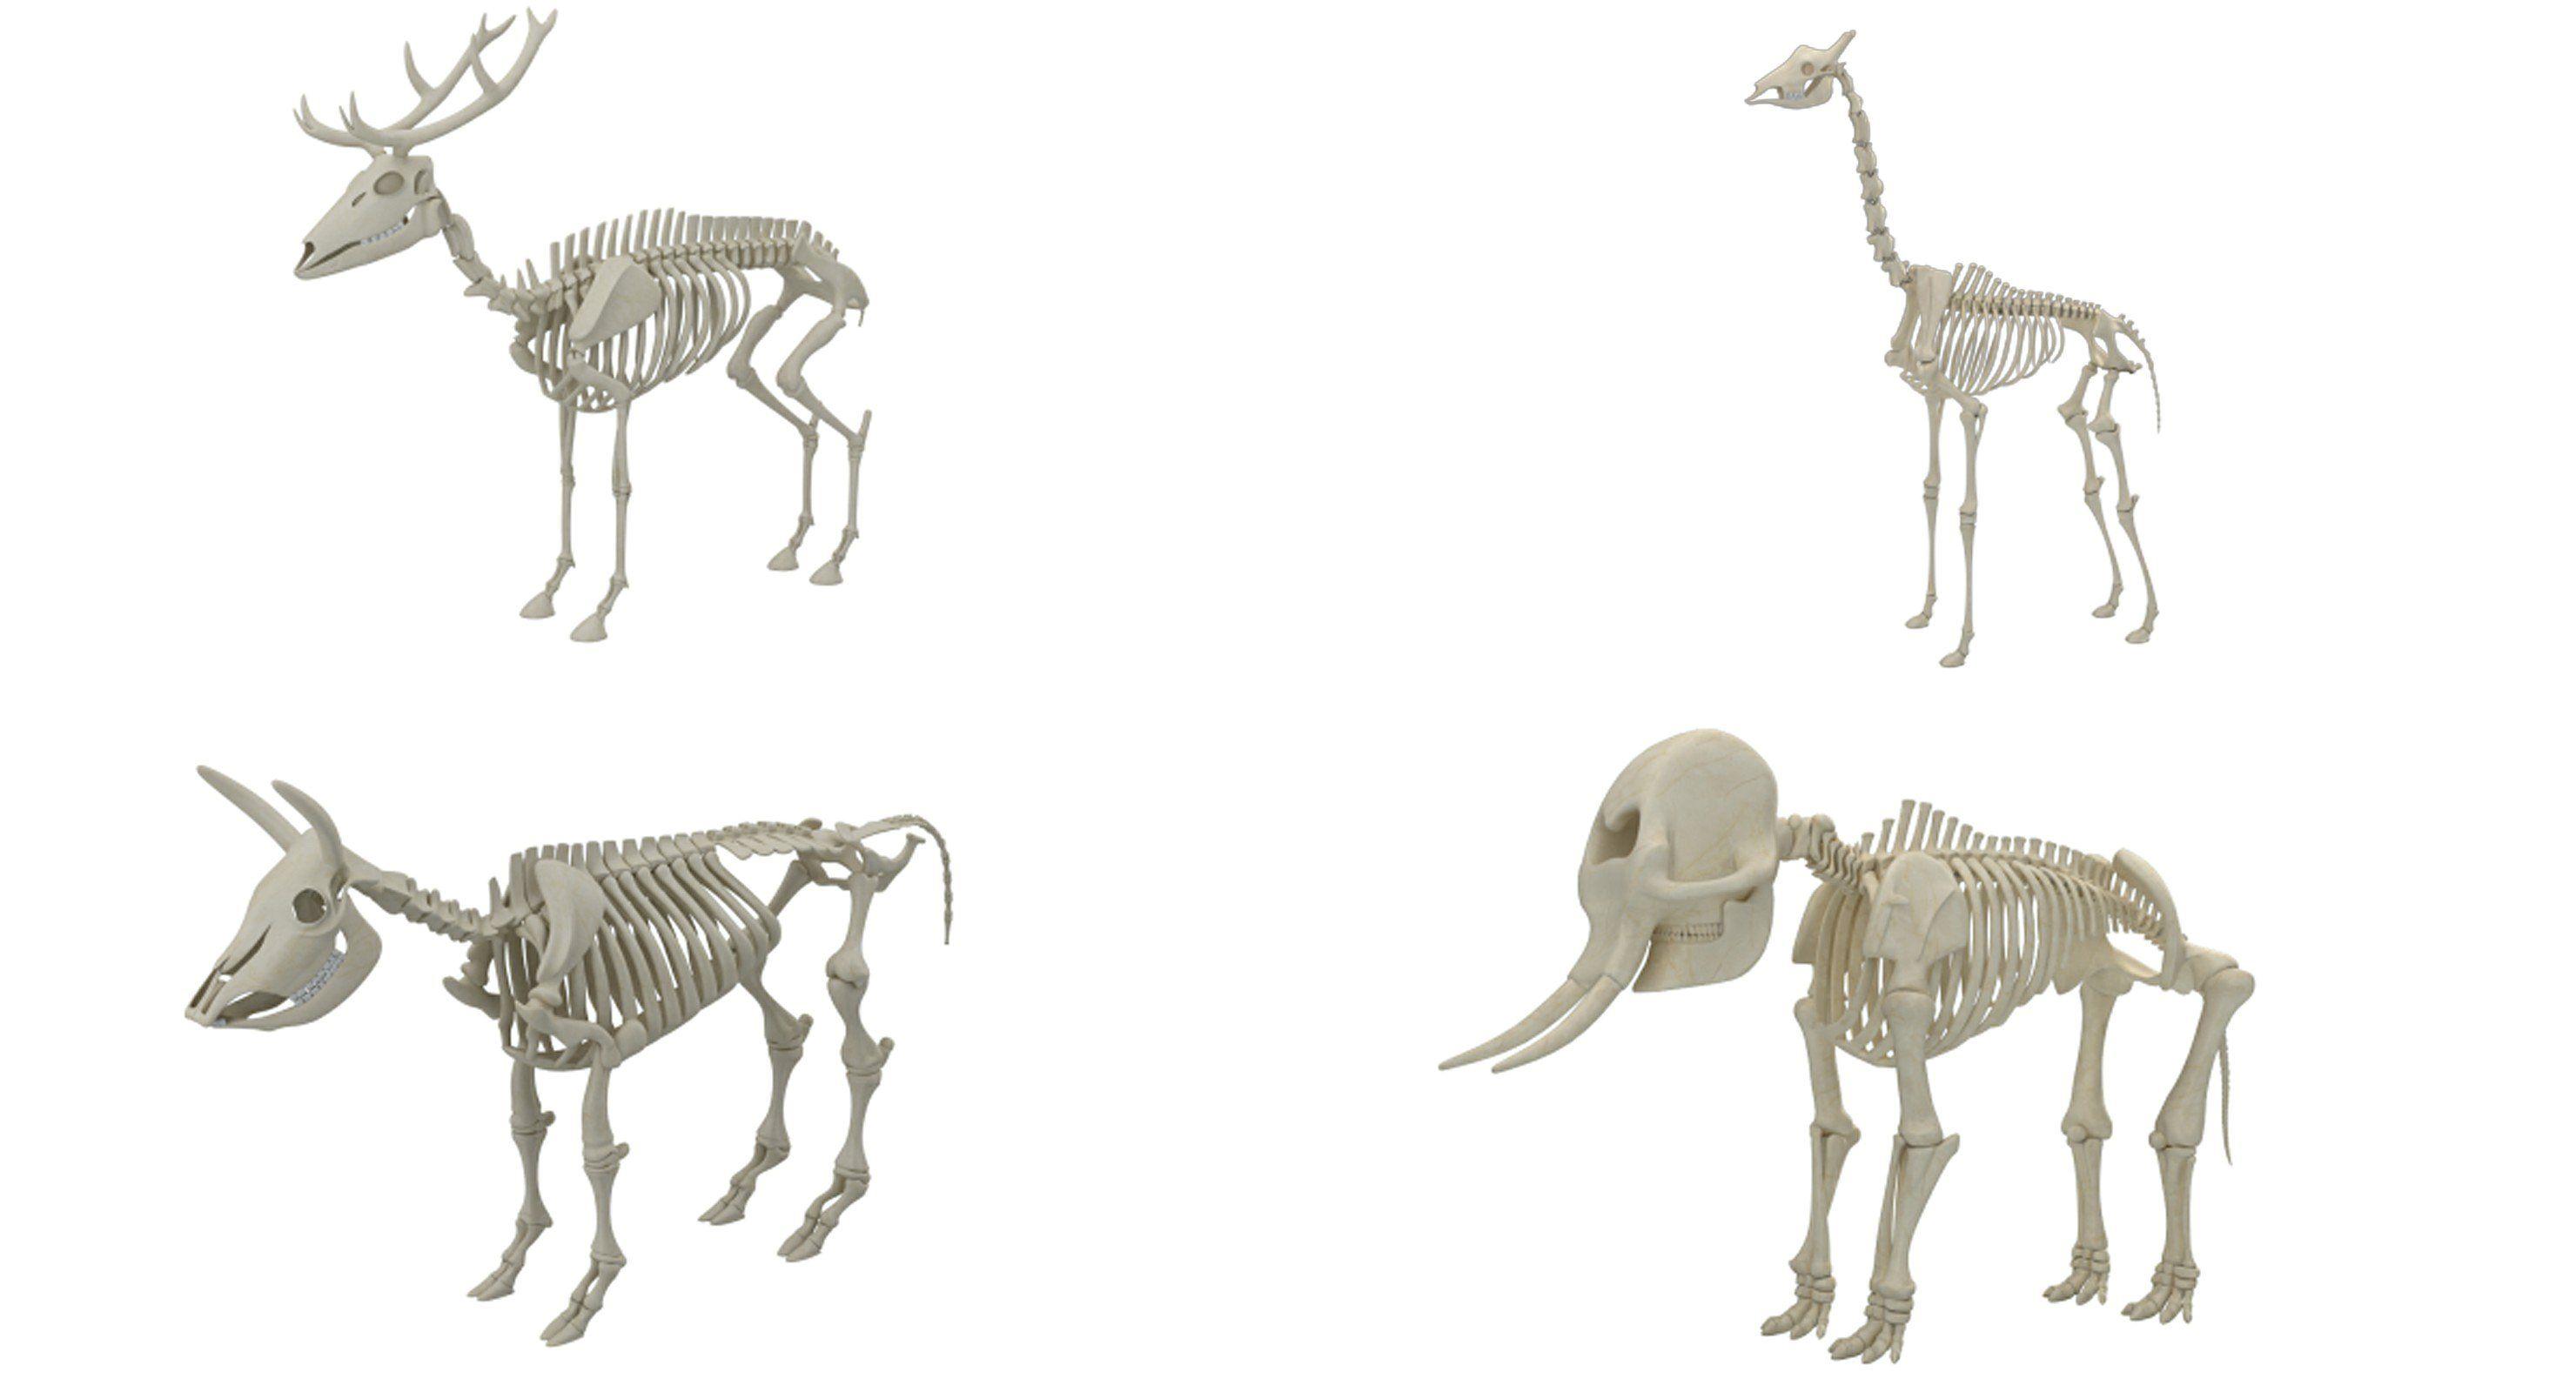 Animal Skeleton Collection 3D model Animal skeletons